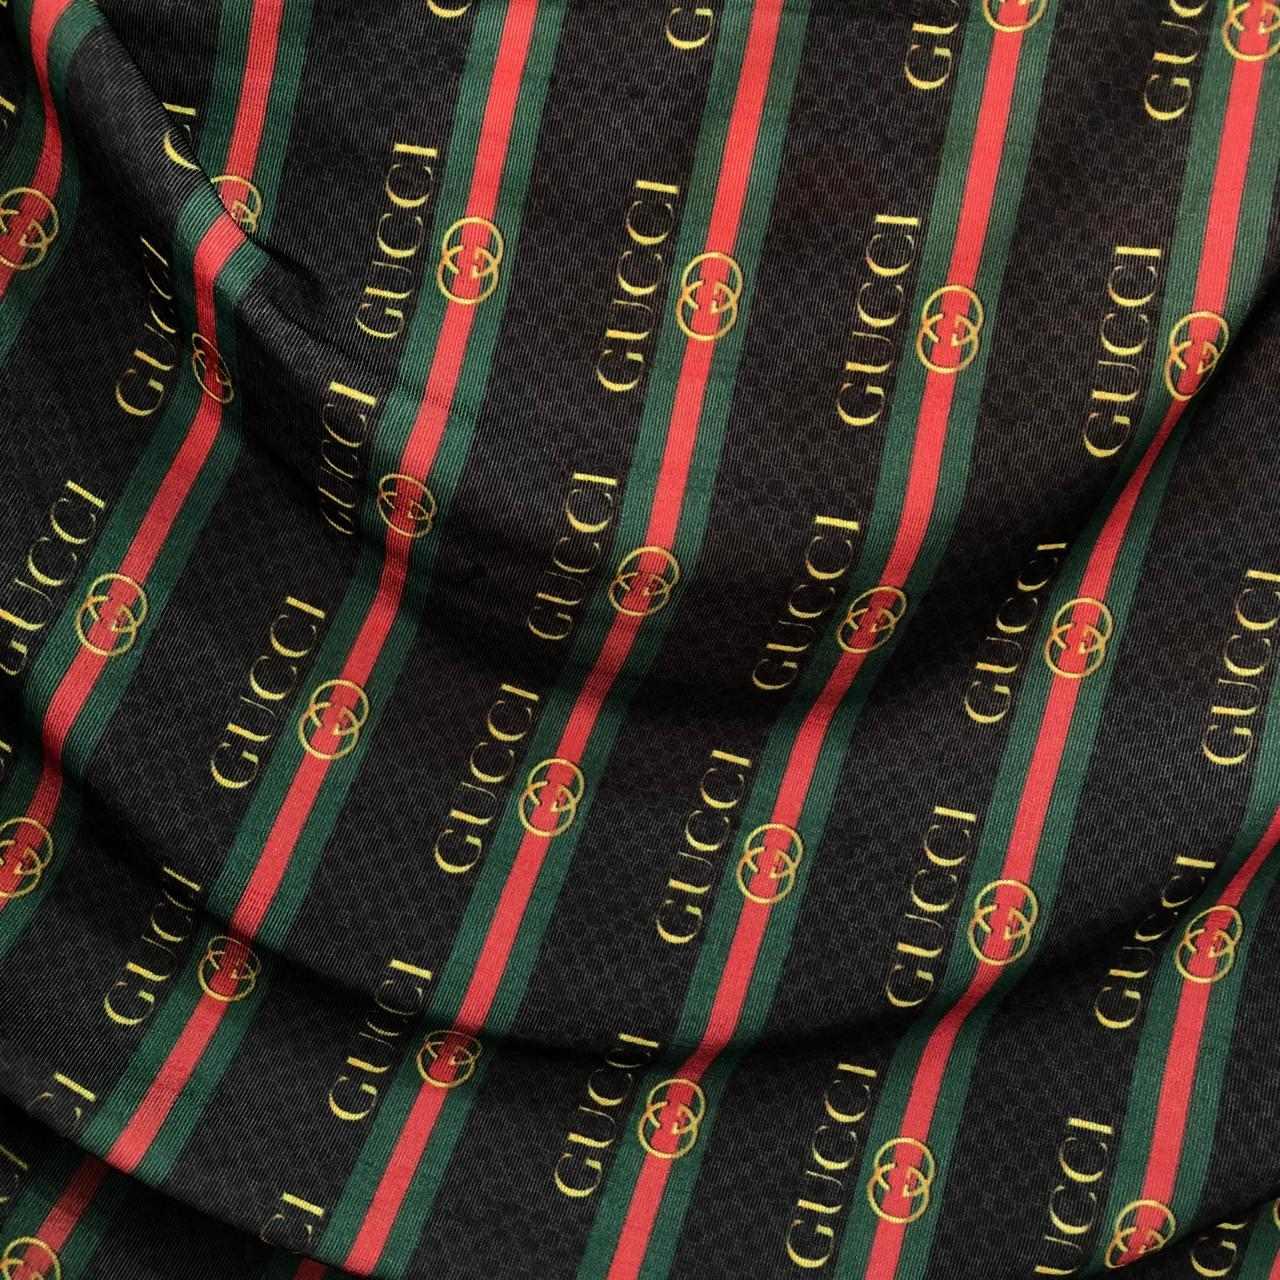 Tecido Malha Slinky Estampado 92%Poliéster 8%Elastano Gucci